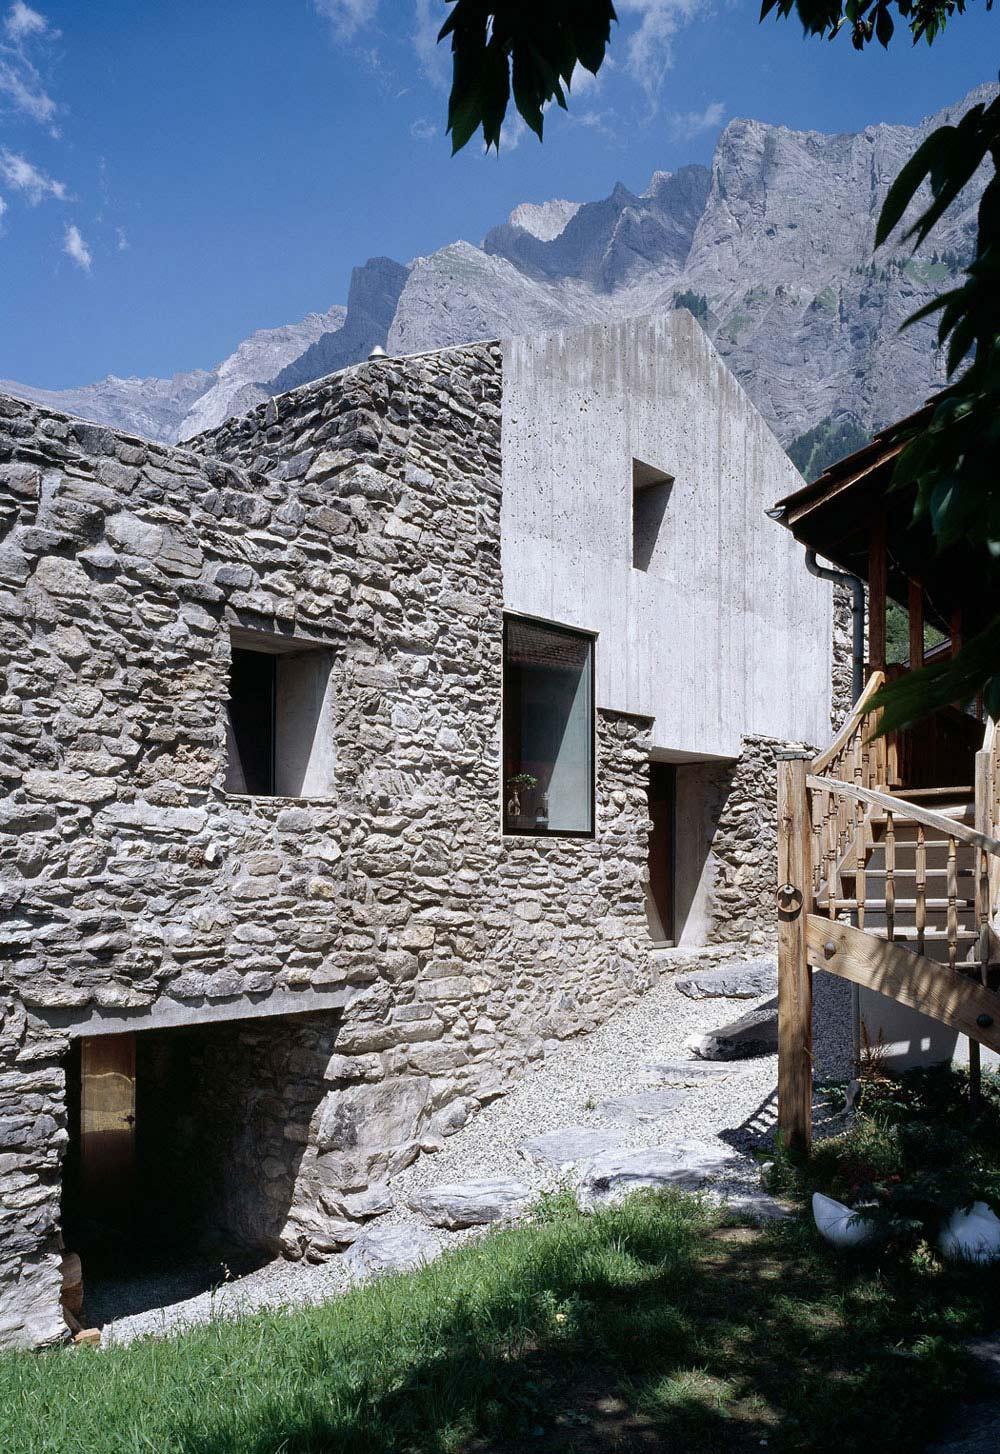 Concrete, Stone Walls, Renovation in Chamoson, Switzerland by Savioz Fabrizzi Architecte